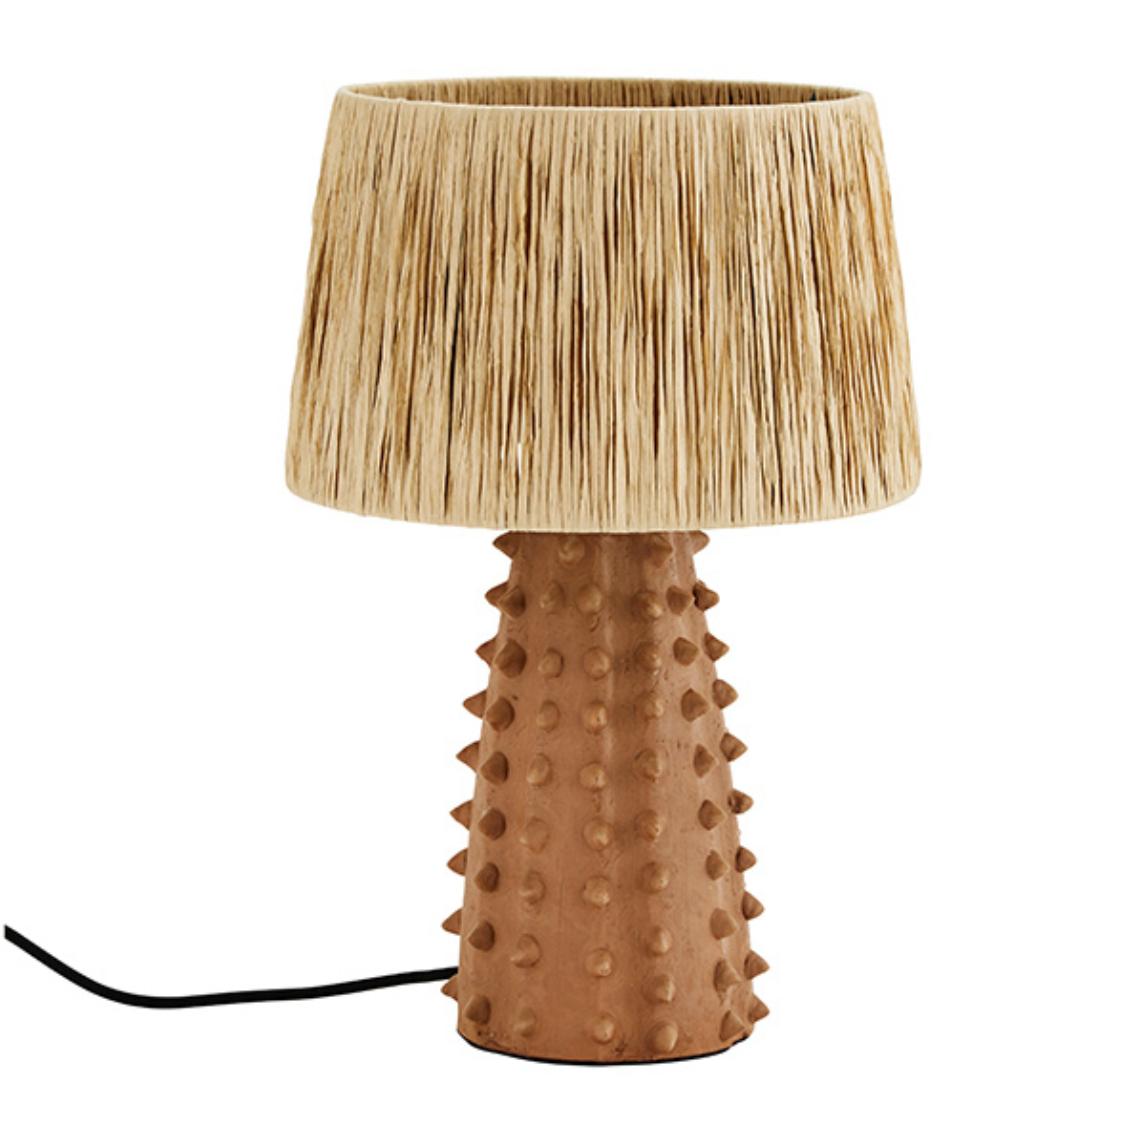 Madam Stolz Tafellamp Terracotta met Raffia Kap